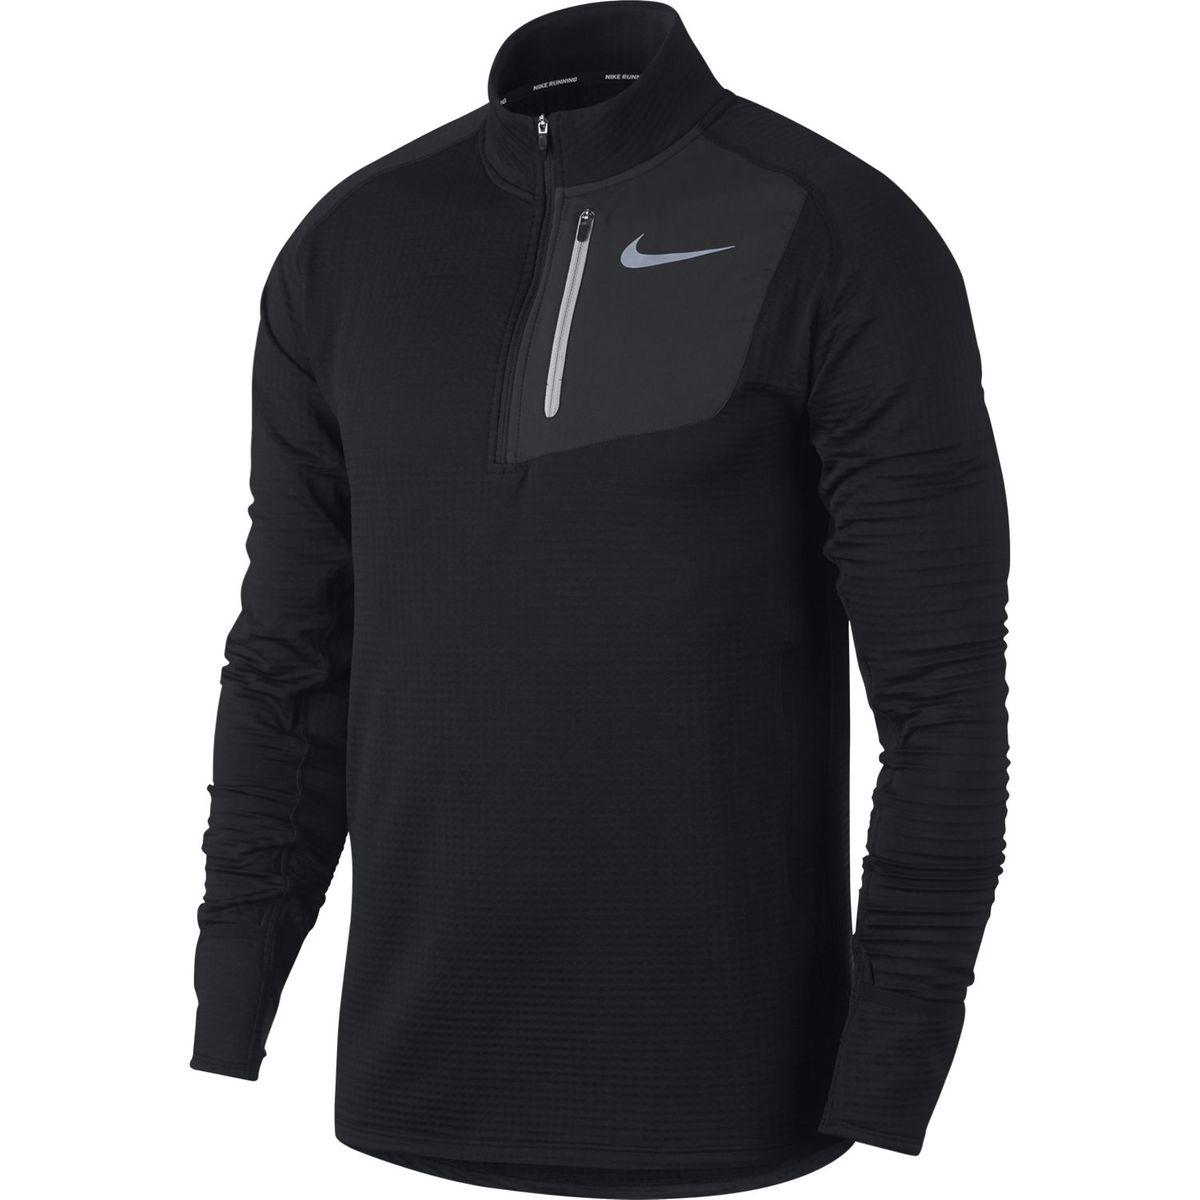 T-shirt Nike Therma Sphere